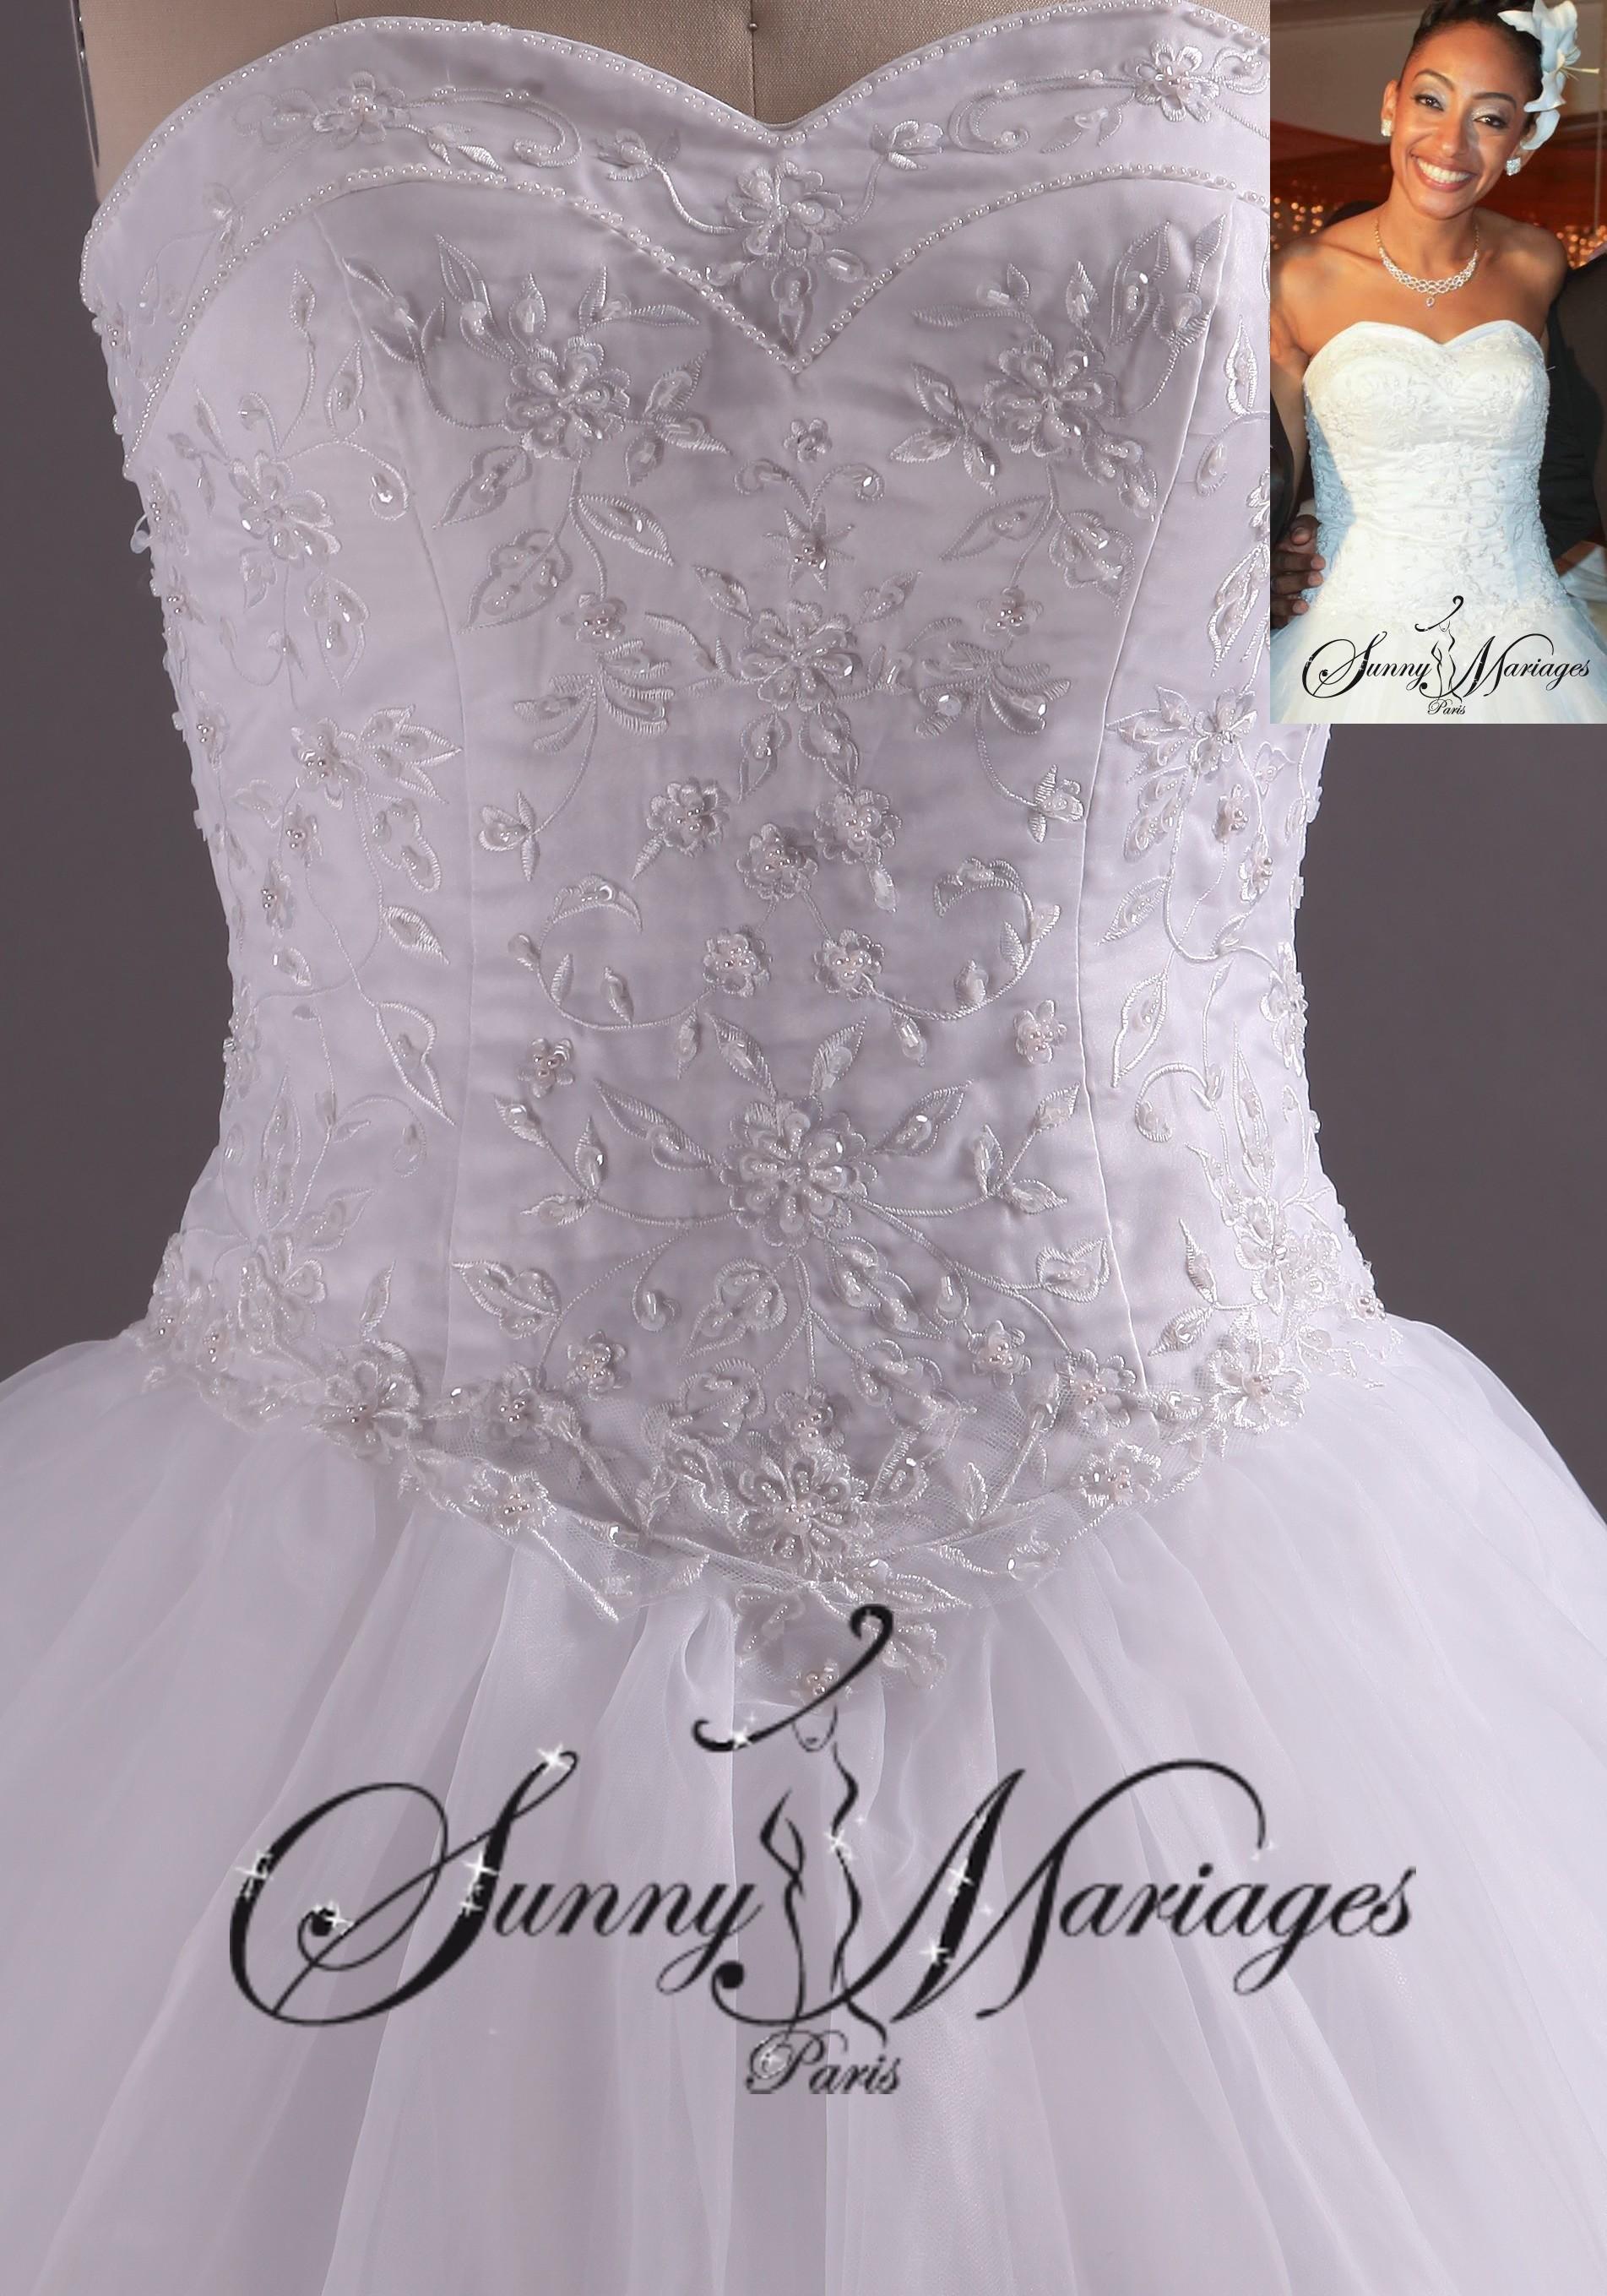 robe blanche de mariee le mariage. Black Bedroom Furniture Sets. Home Design Ideas